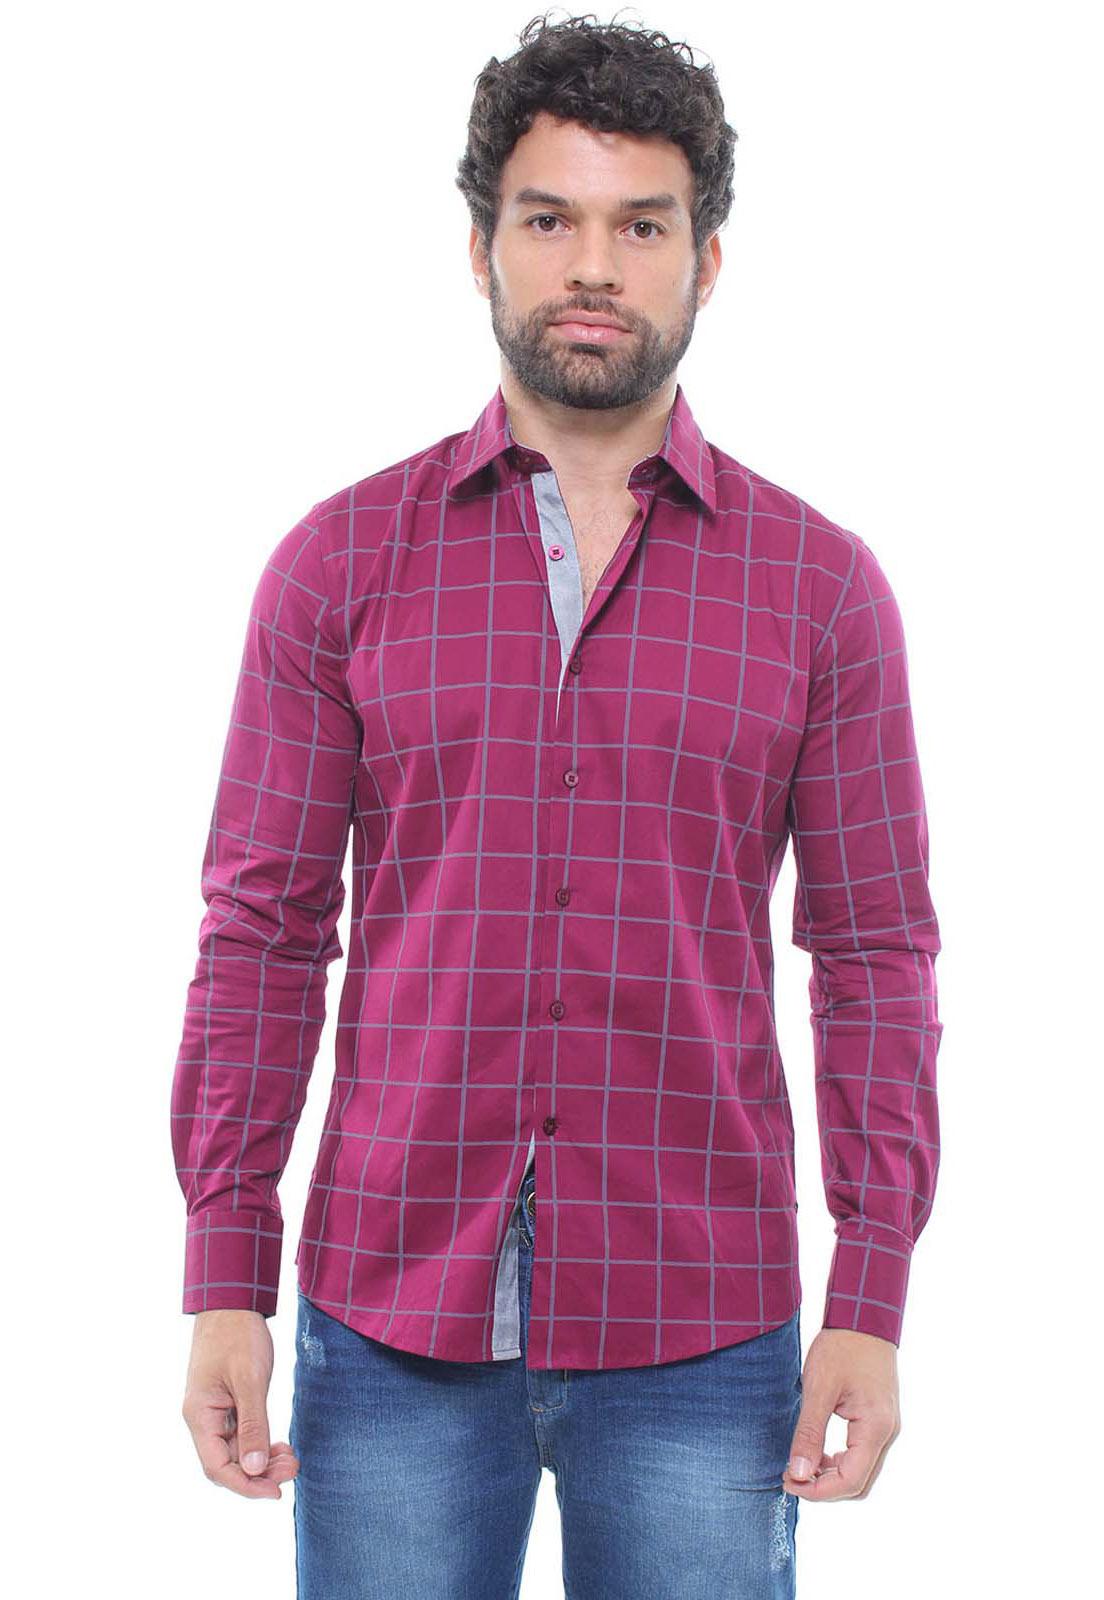 Camisa Estampada Masculina Fit Manga Longa Crocker - 47155  - CROCKER JEANS